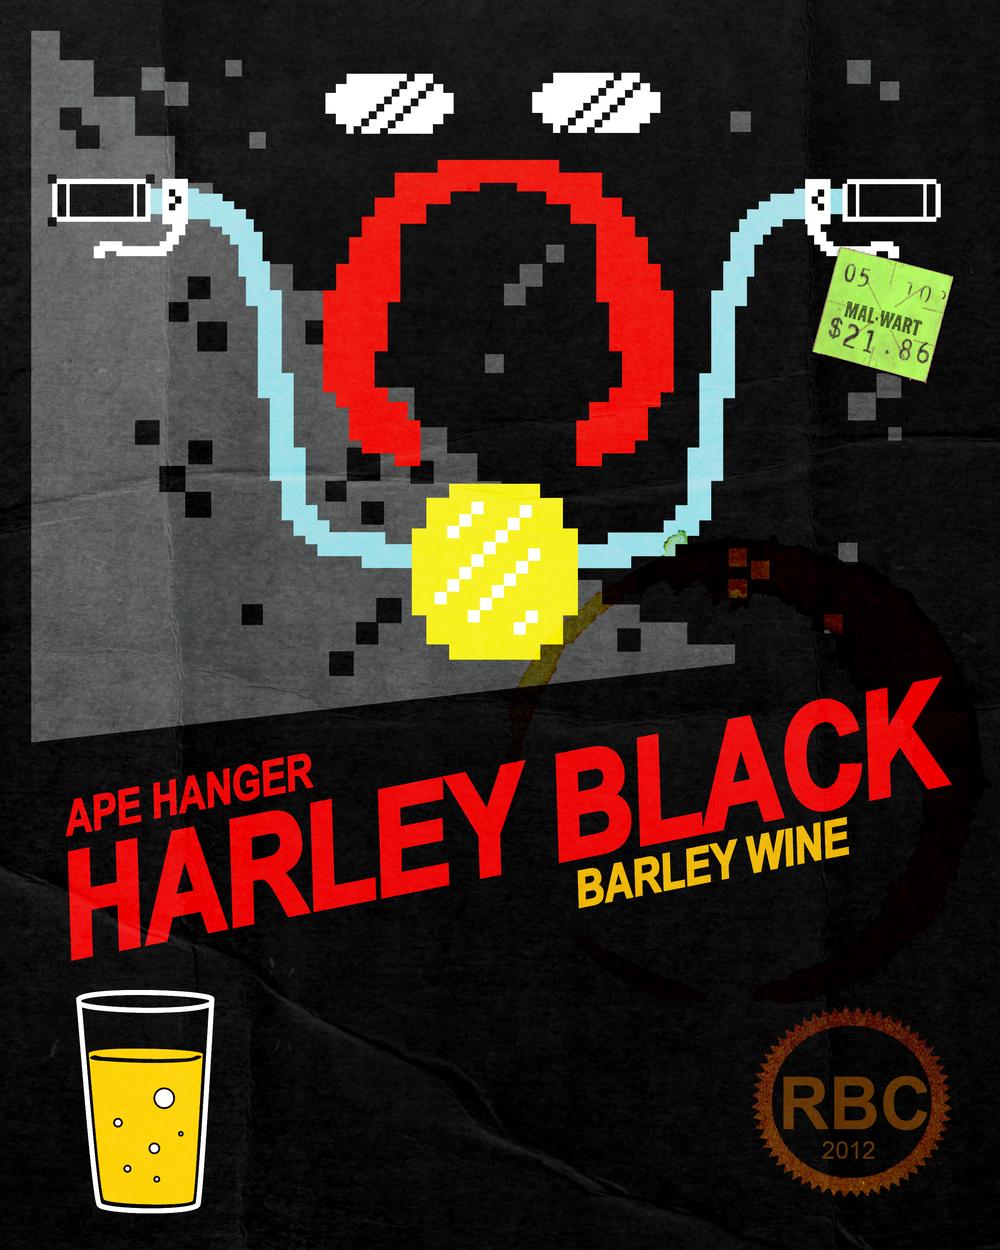 """Ape Hanger - Harley Black Barley Wine"" , - concept, for non-profit"